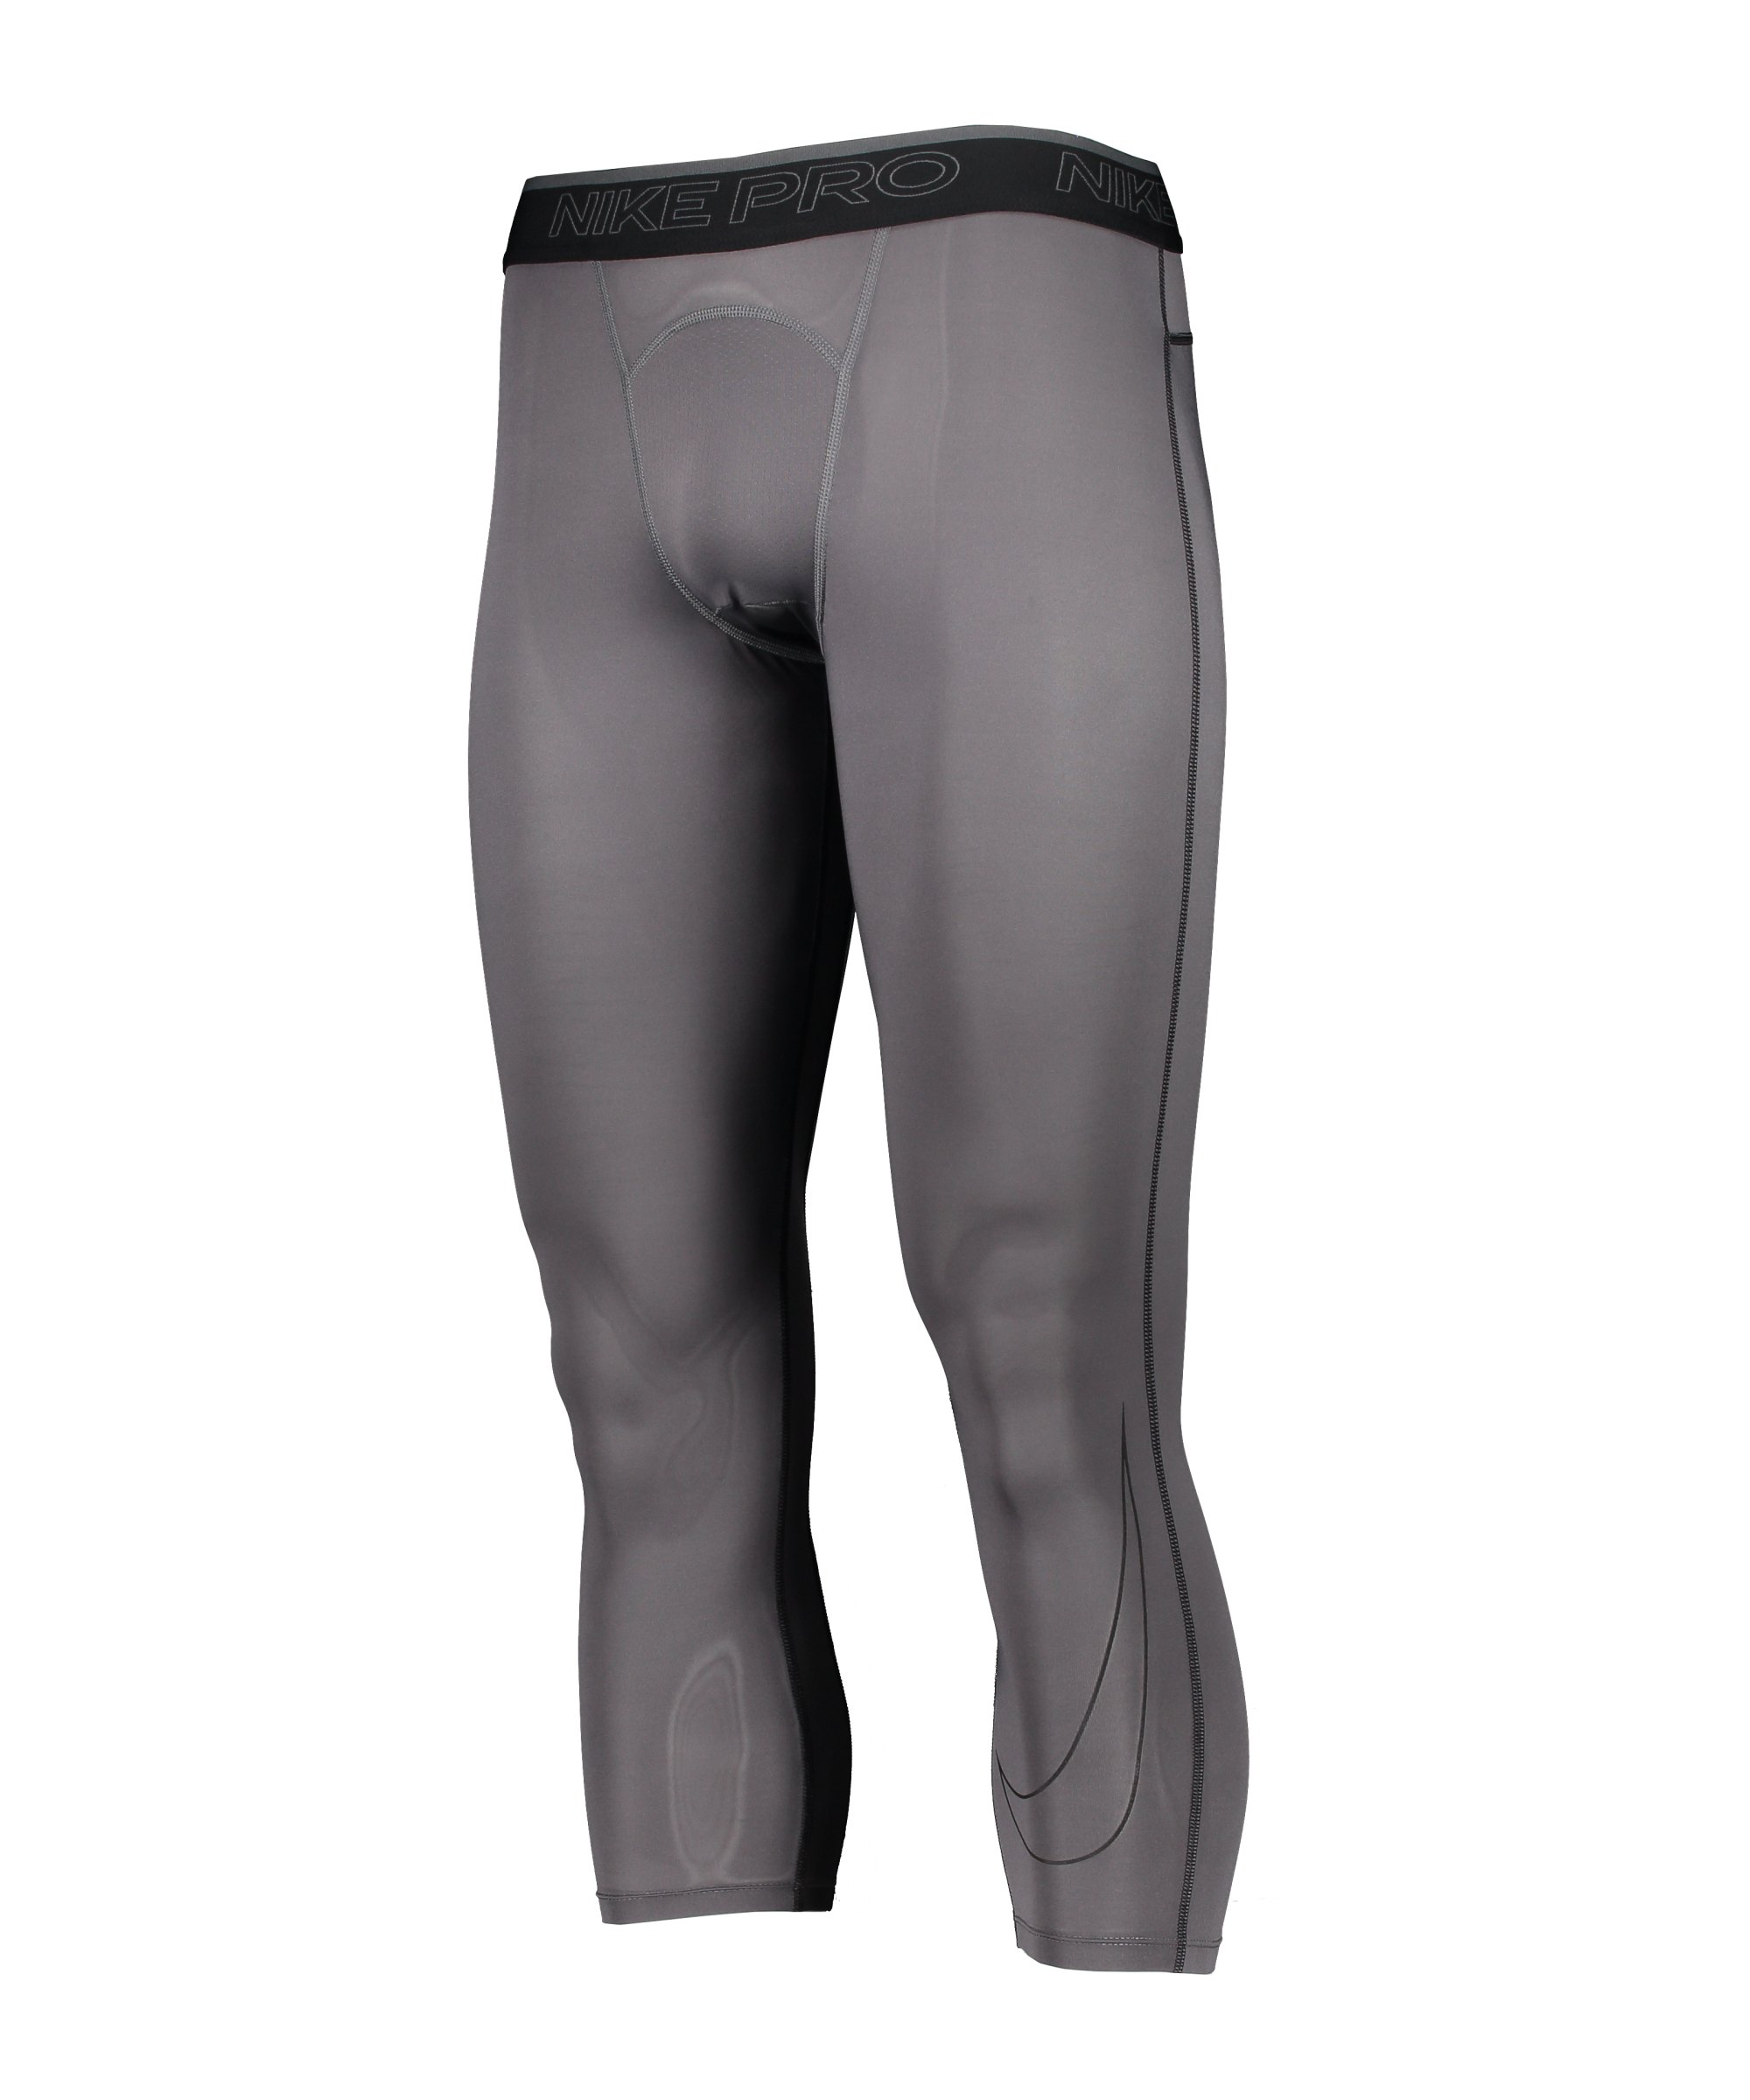 Nike Pro Dri-FIT 3/4 Tight Grau Schwarz F068 - grau